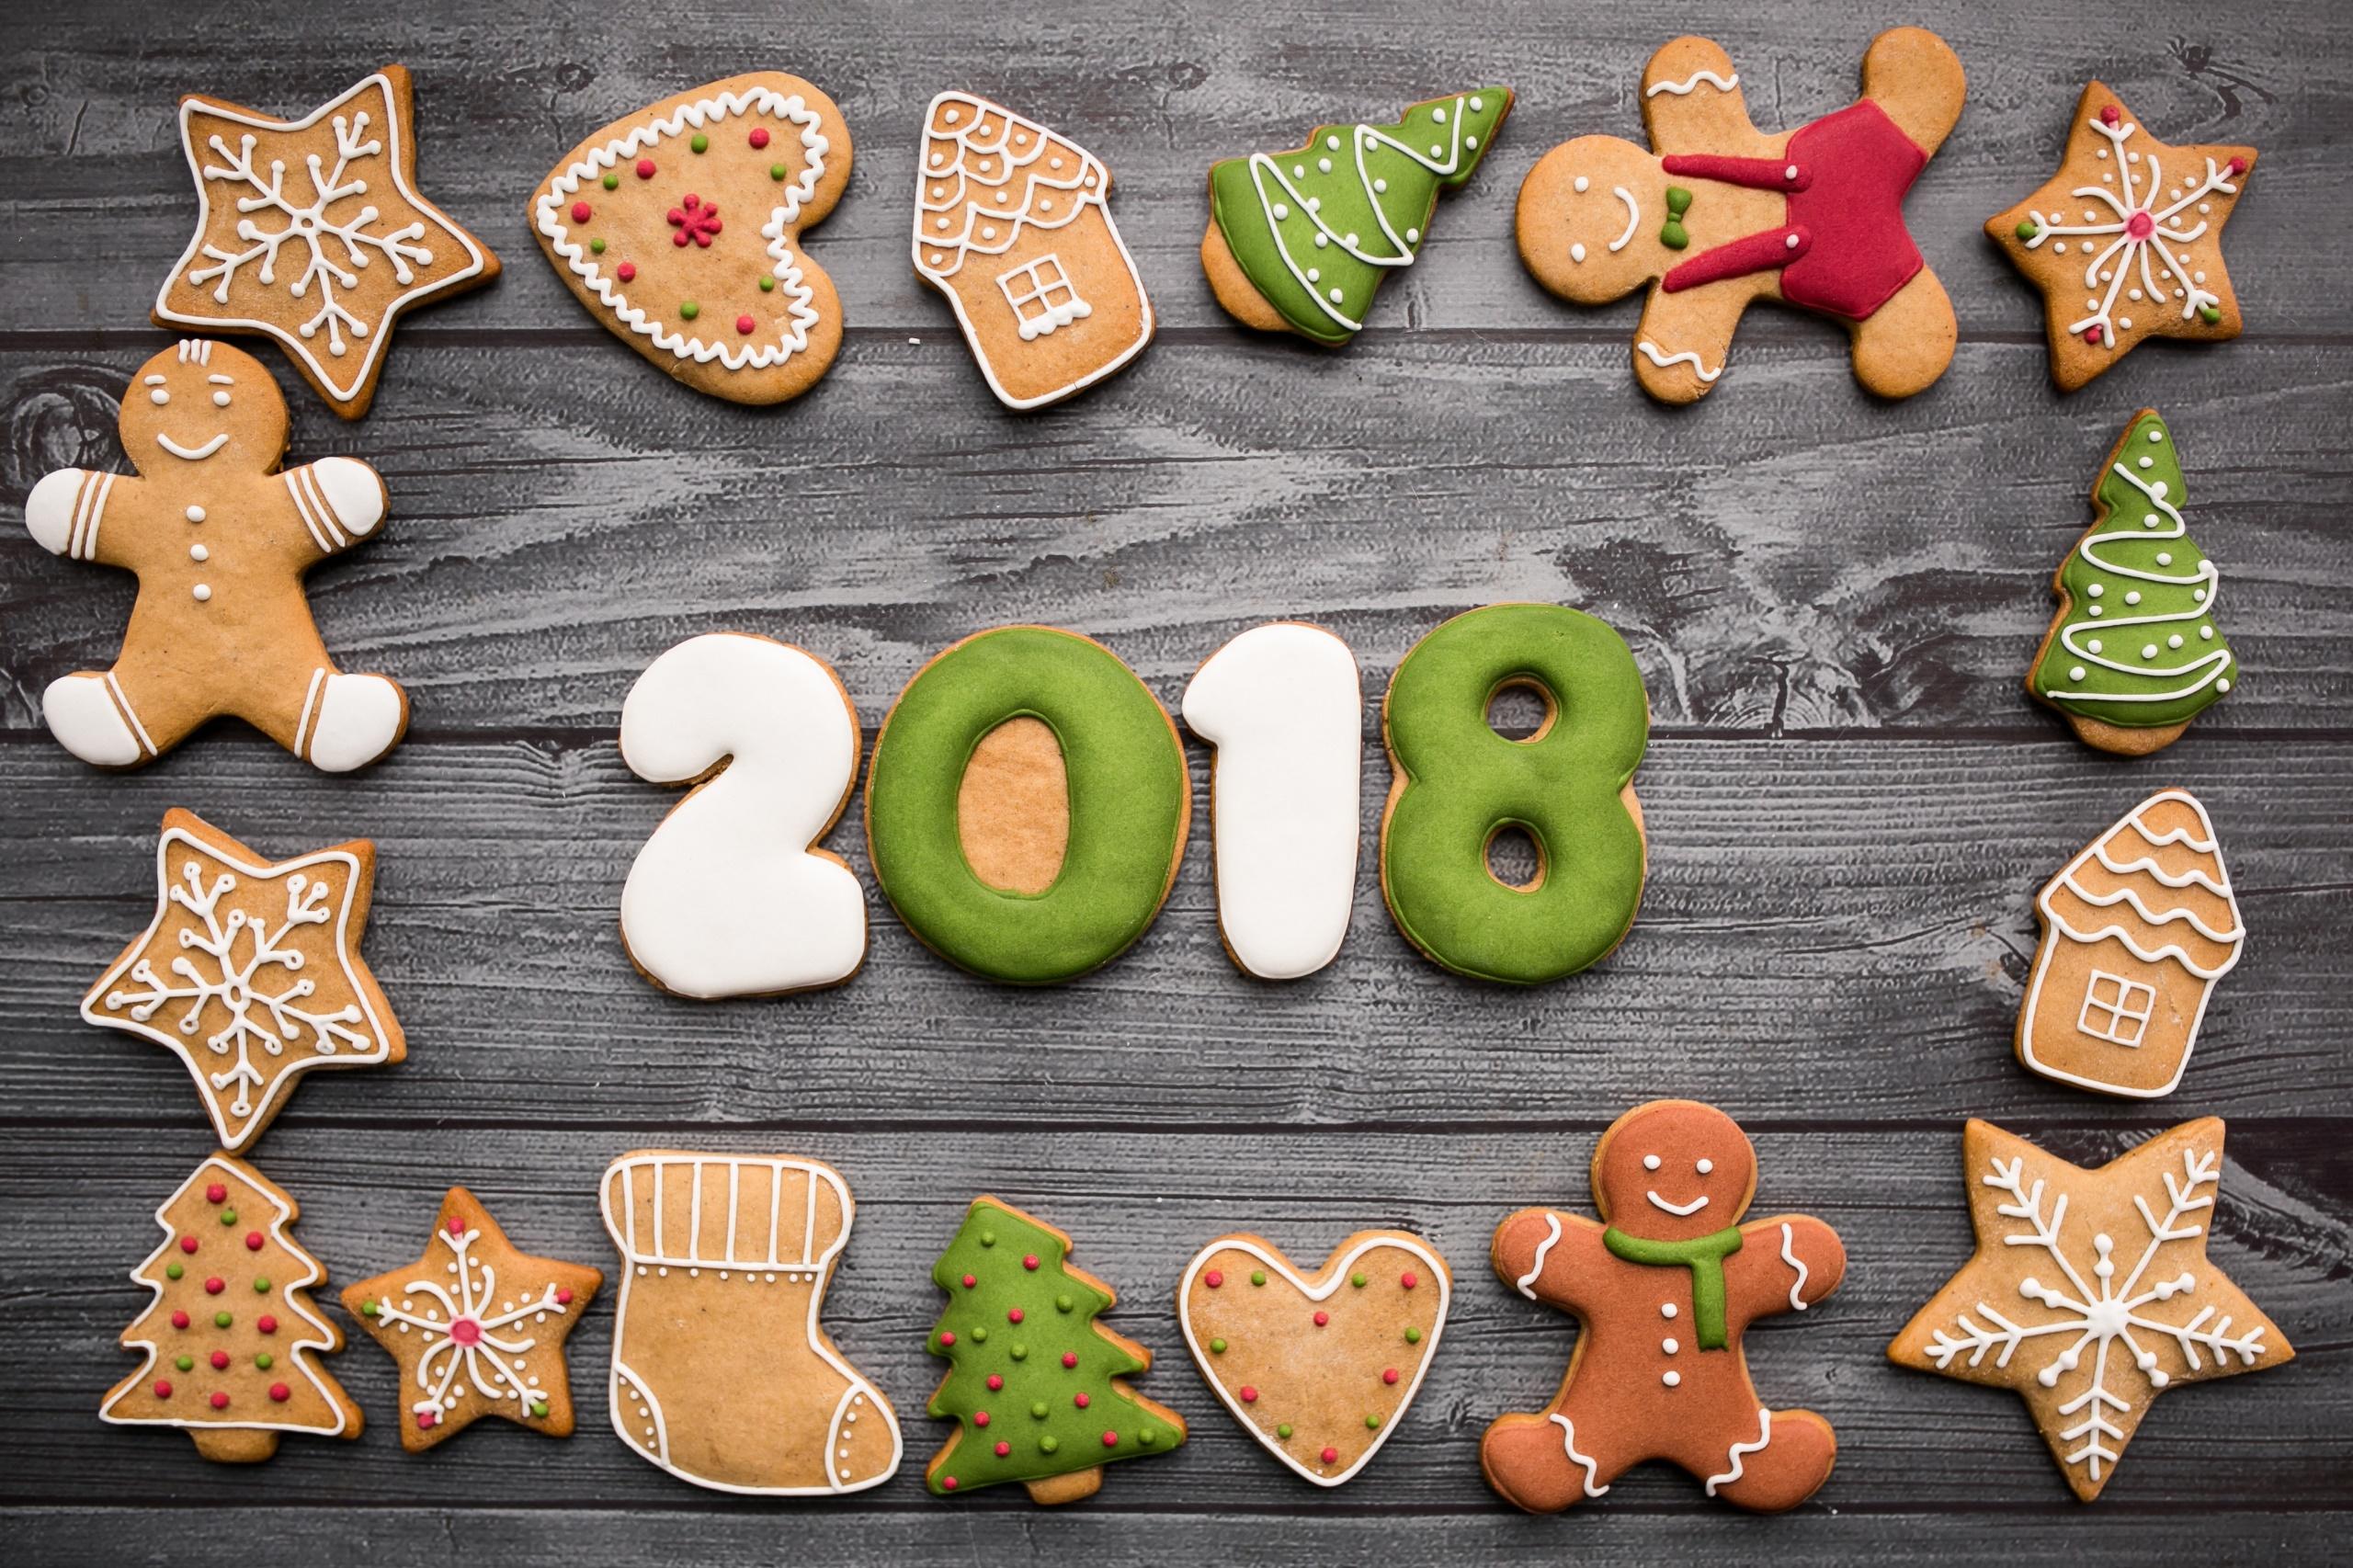 Fondos De Pantalla De Galletas: Fondos De Pantalla : 2018 Year, Comida, Dulces, Galletas